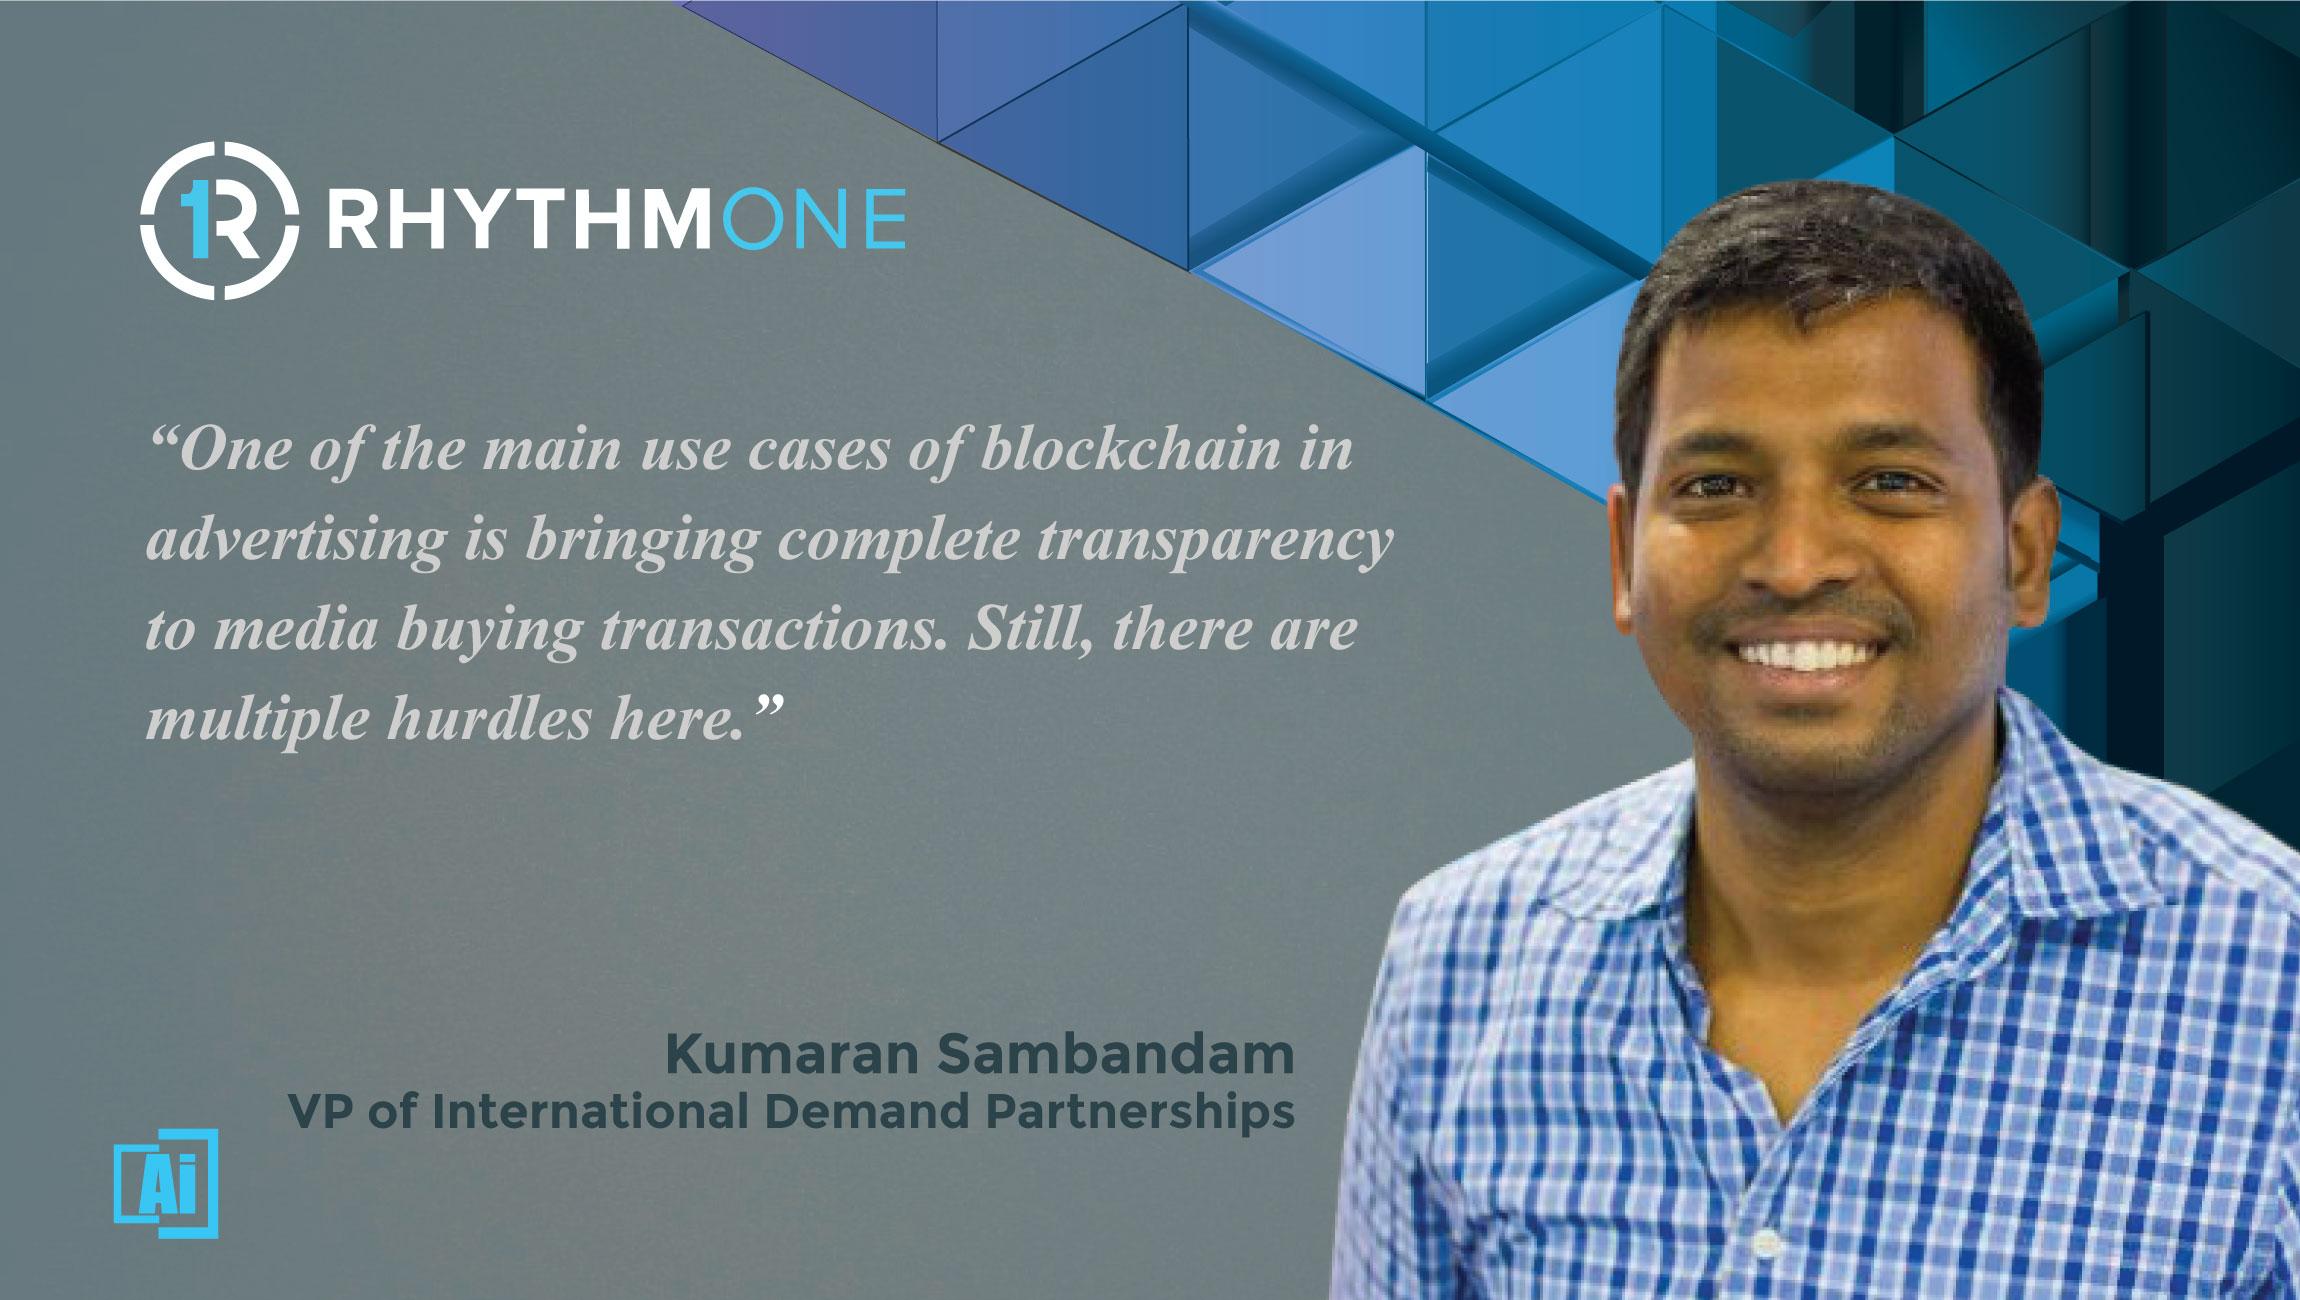 AiThority Interview with Kumaran Sambandam, VP of International Demand Partnerships, RhythmOne- quotes